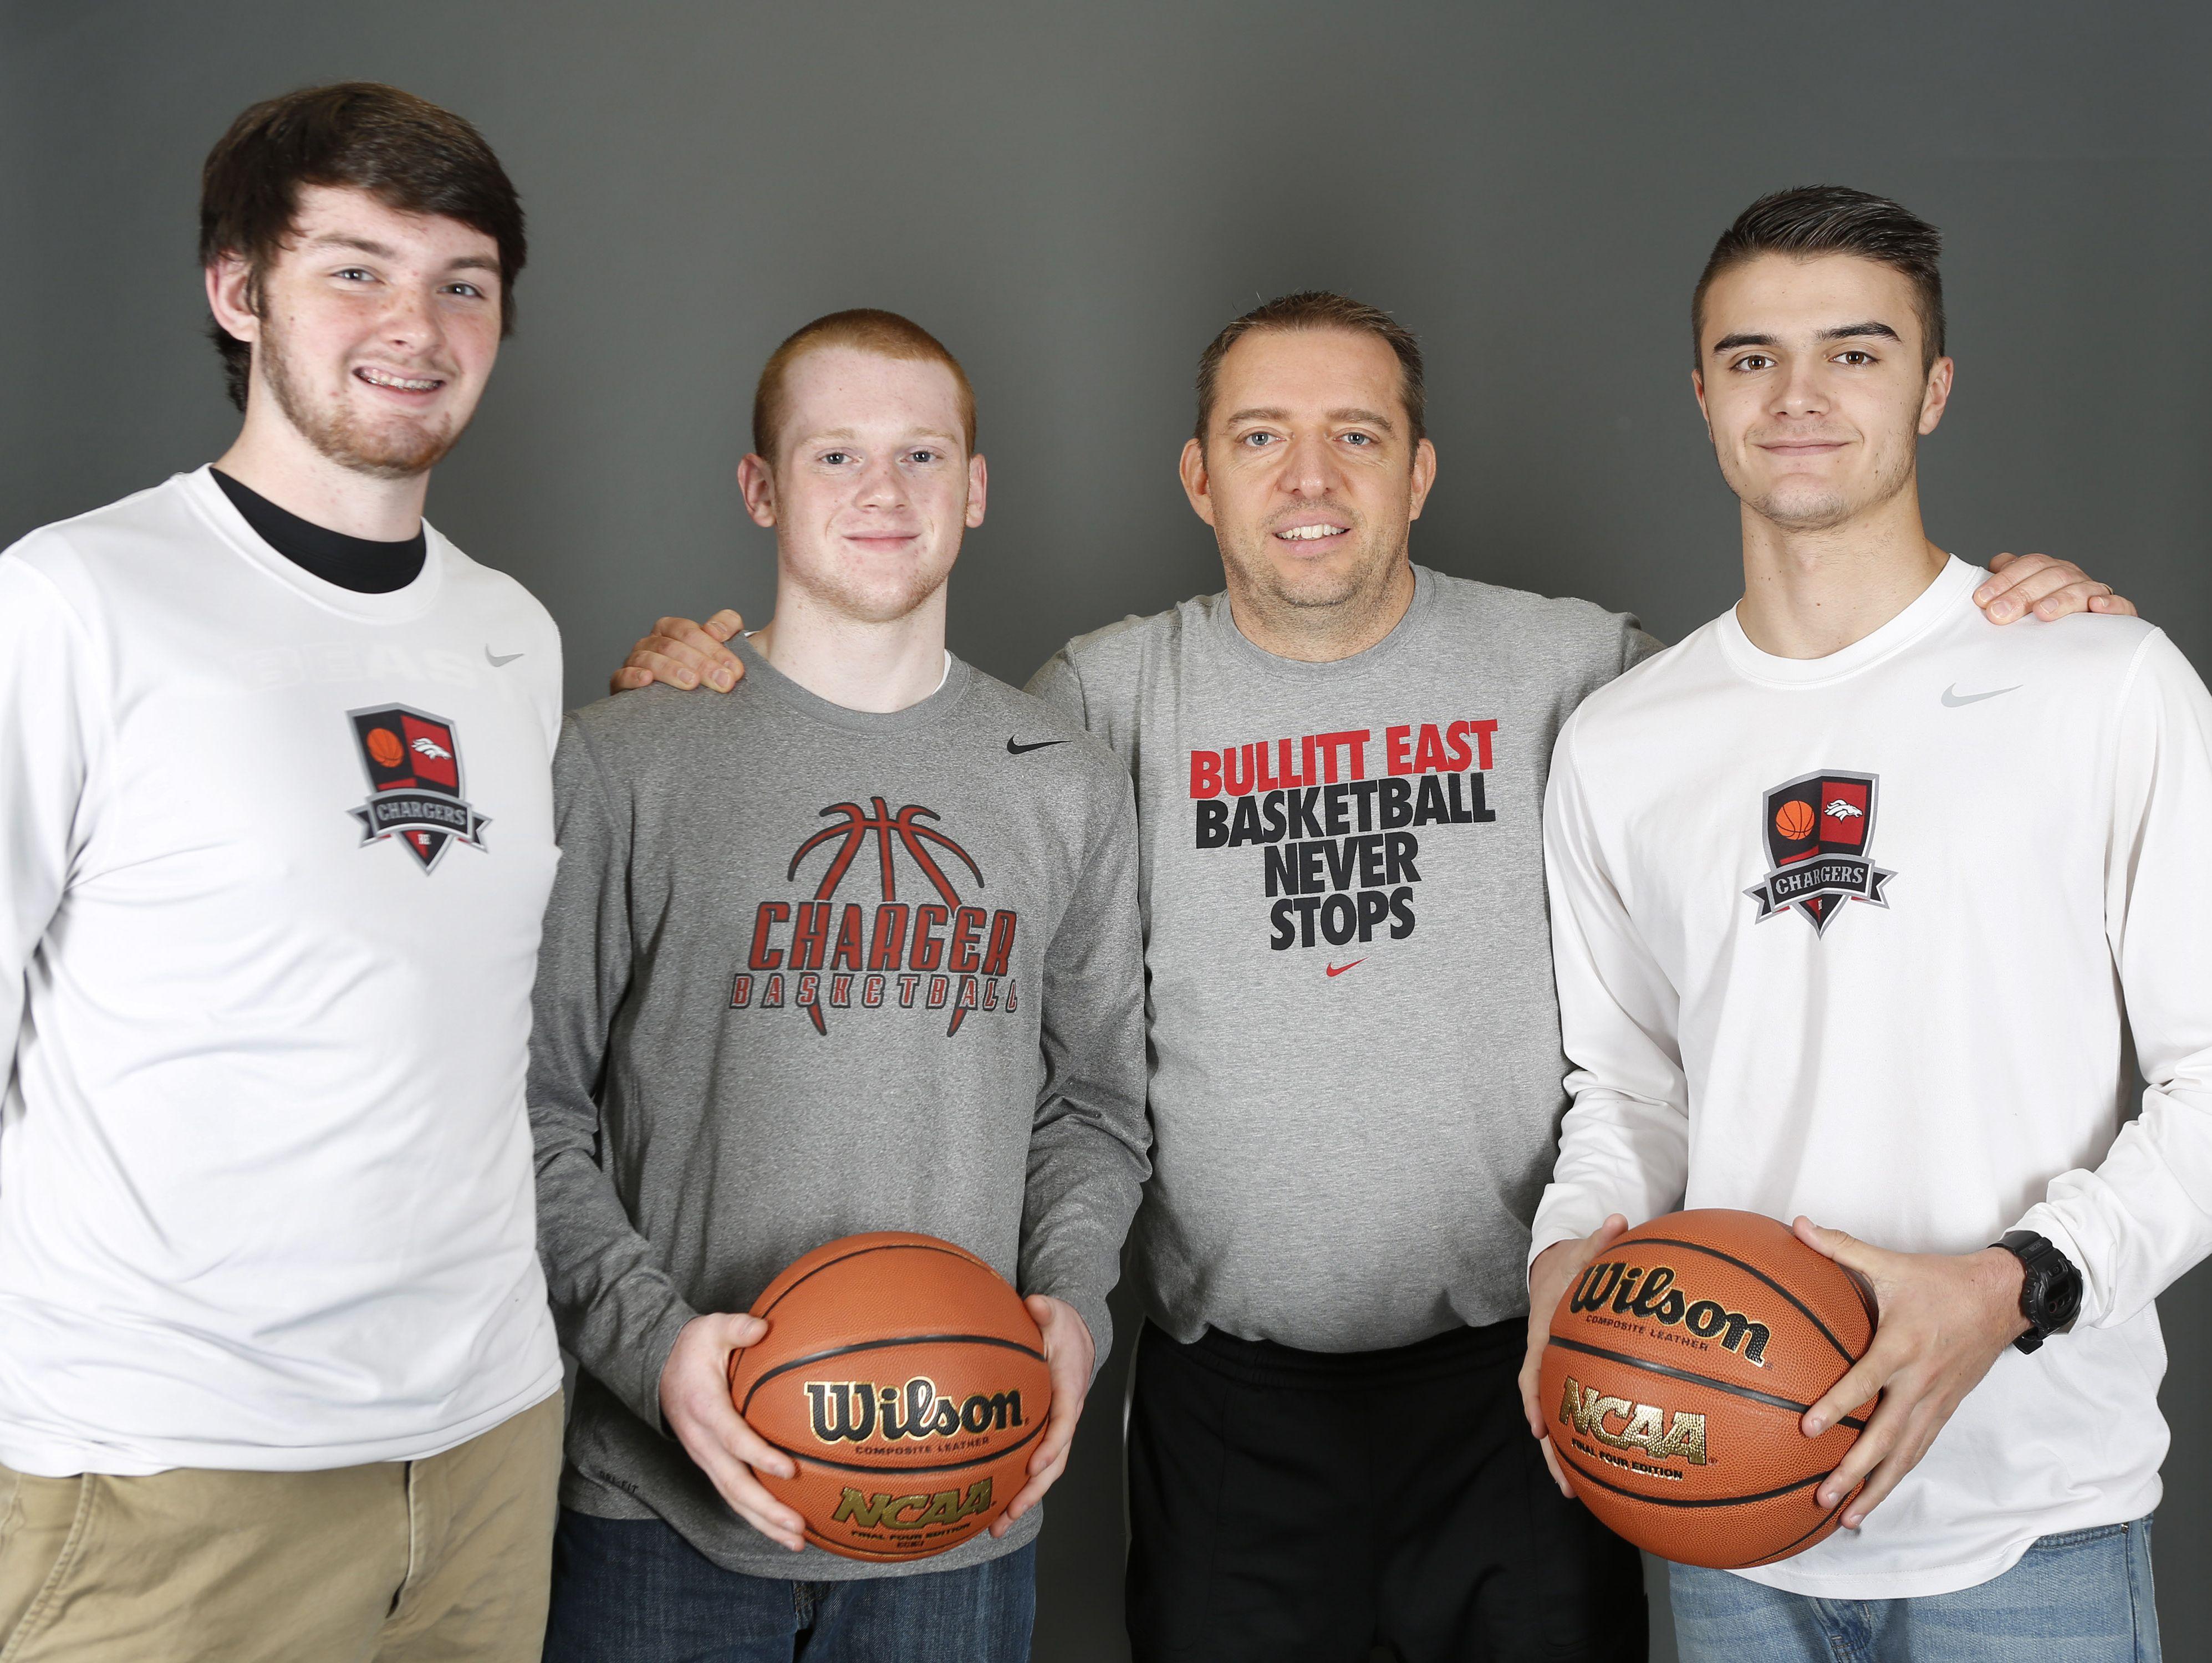 Bullitt East High School basketball players, Grant Skaggs, left, Jared Osborne, coach Jason Couch and Conner Green, right. Nov. 7, 2016